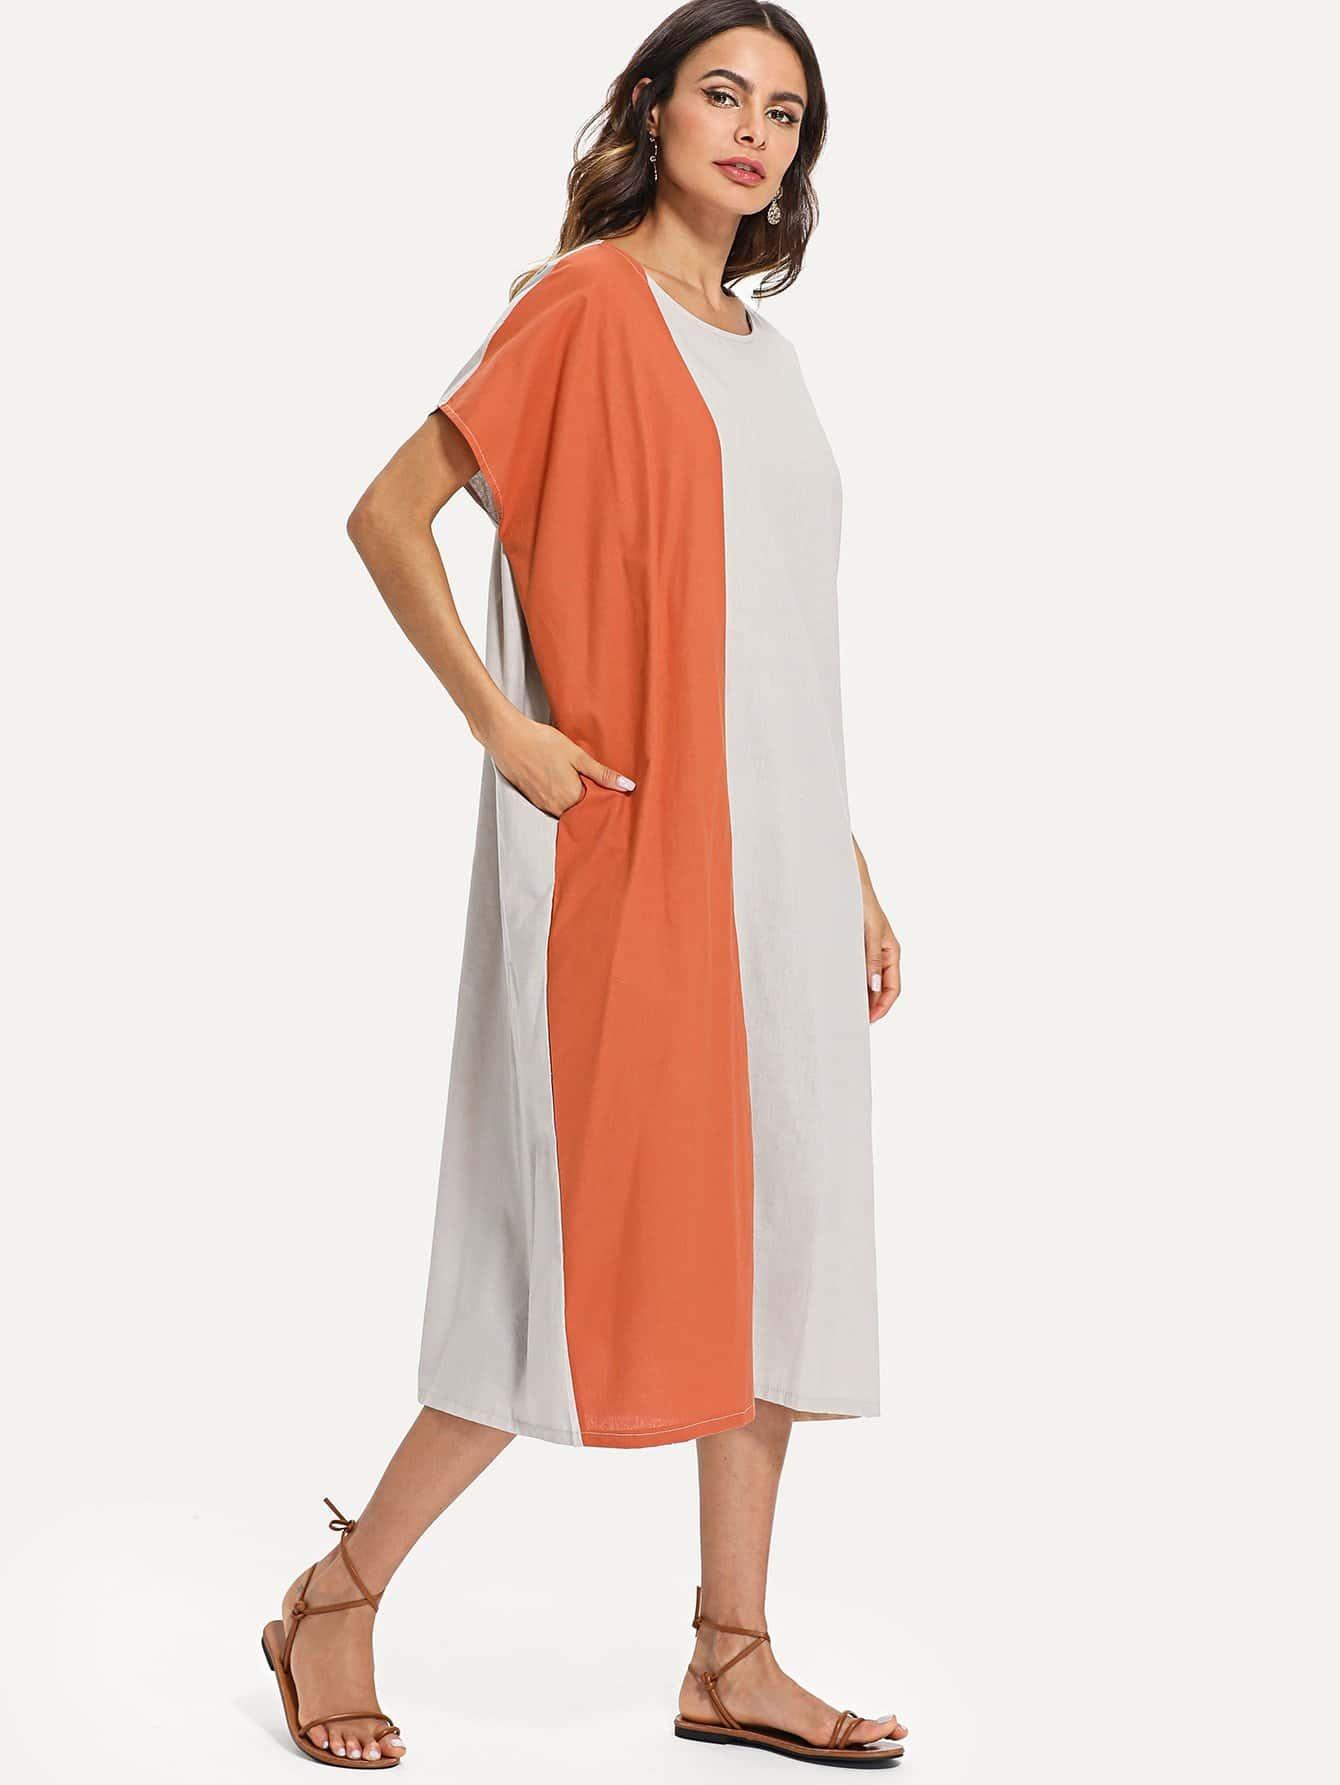 Colorblock Hidden Pocket Dress платье darling ds16 101 navy soft pink